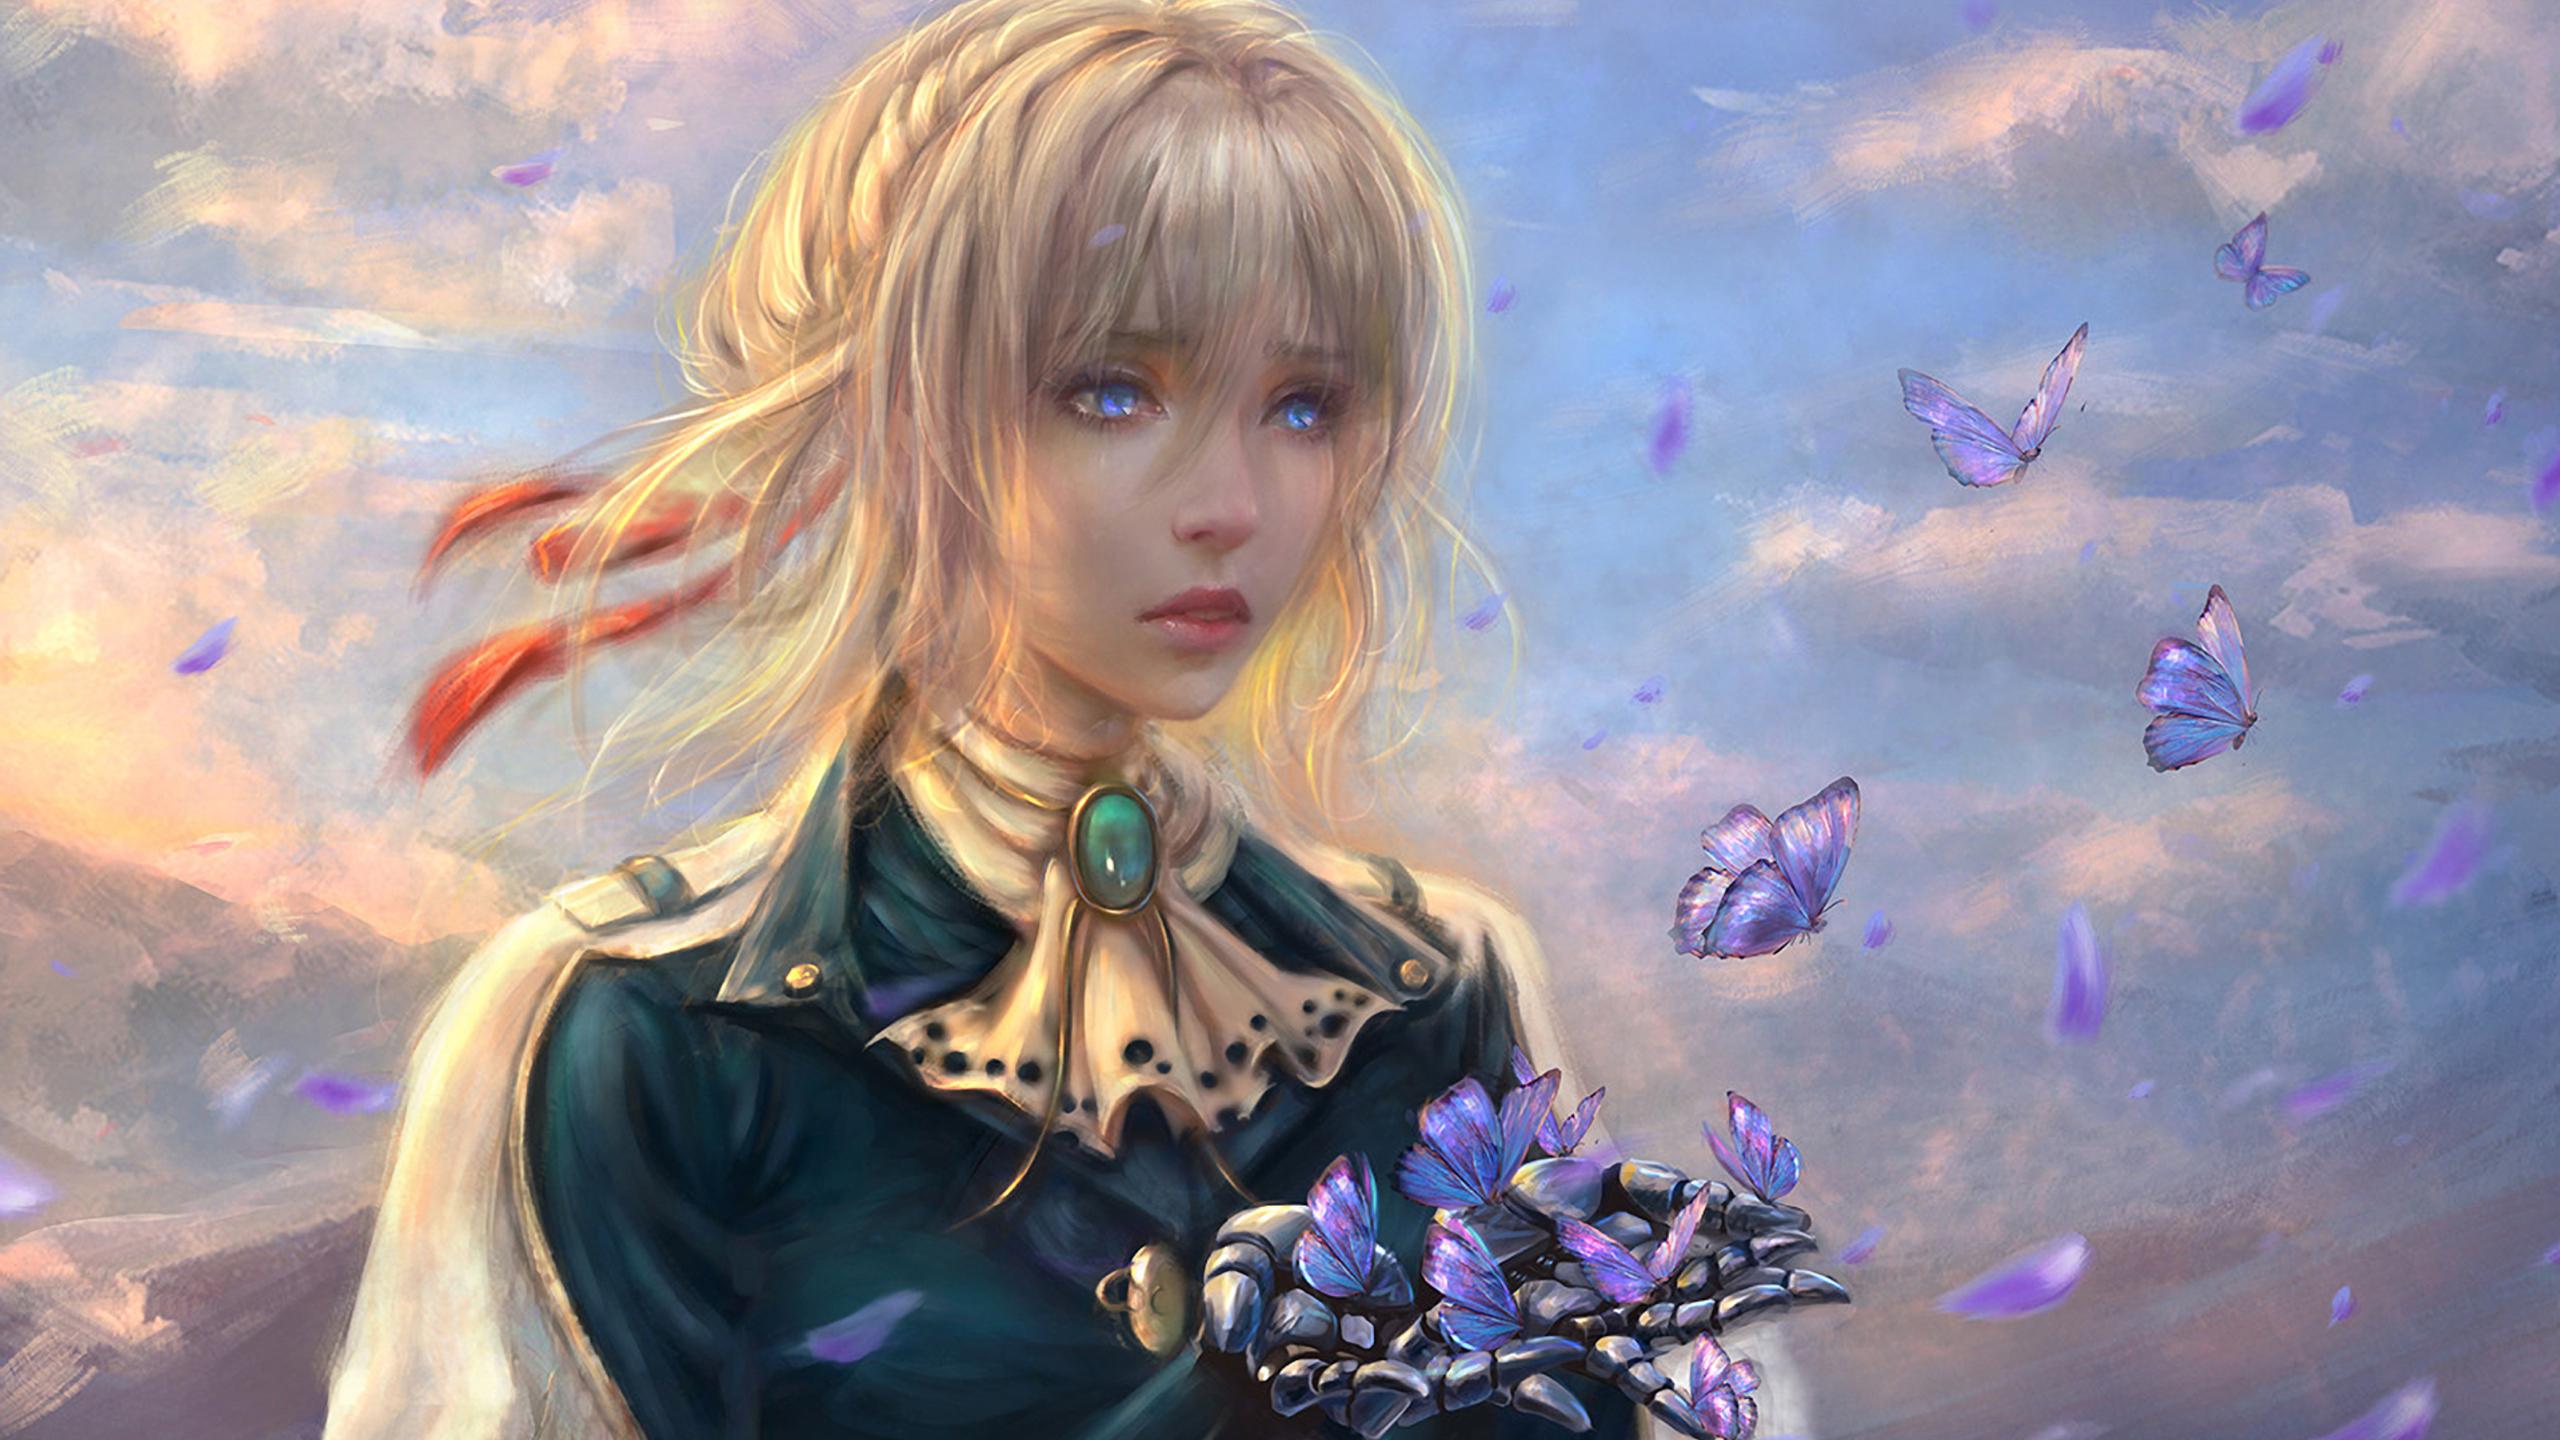 2560x1440 Violet Evergarden Anime Girl 1440P Resolution HD ...